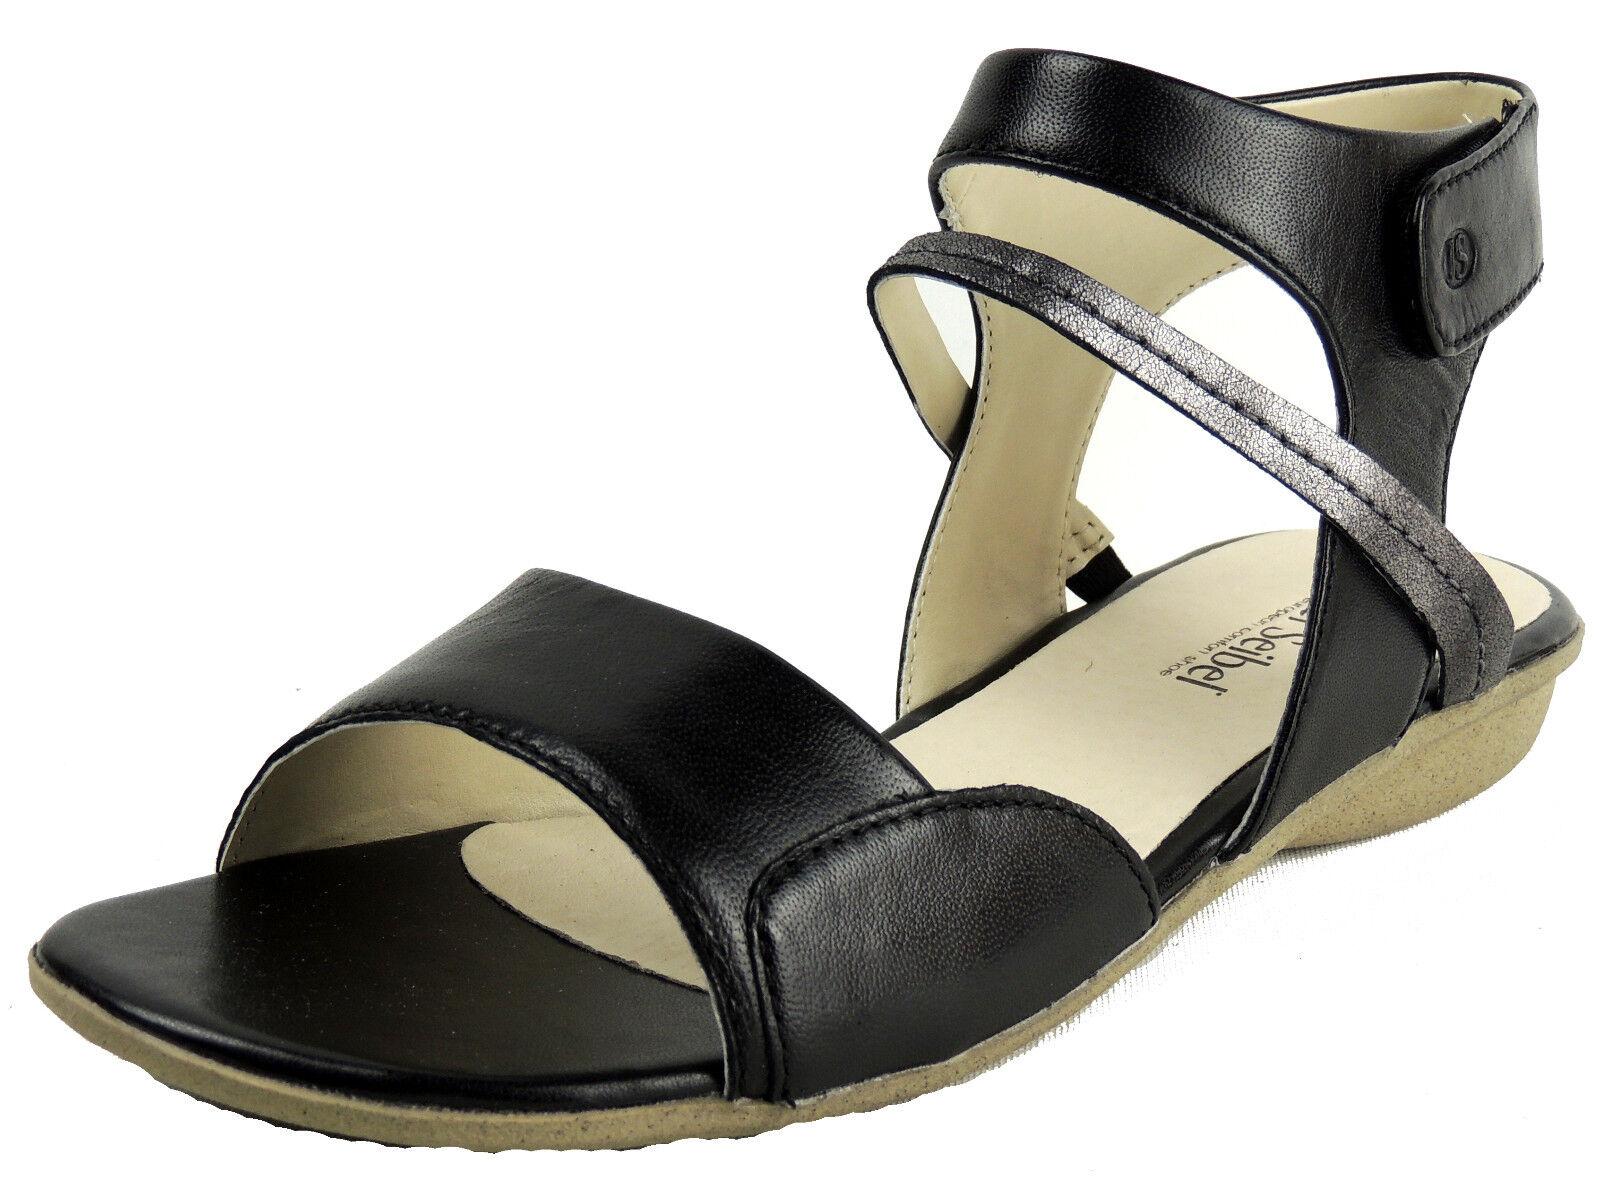 Josef Seibel Femmes Sandale Velcro Noir Argent Cuir